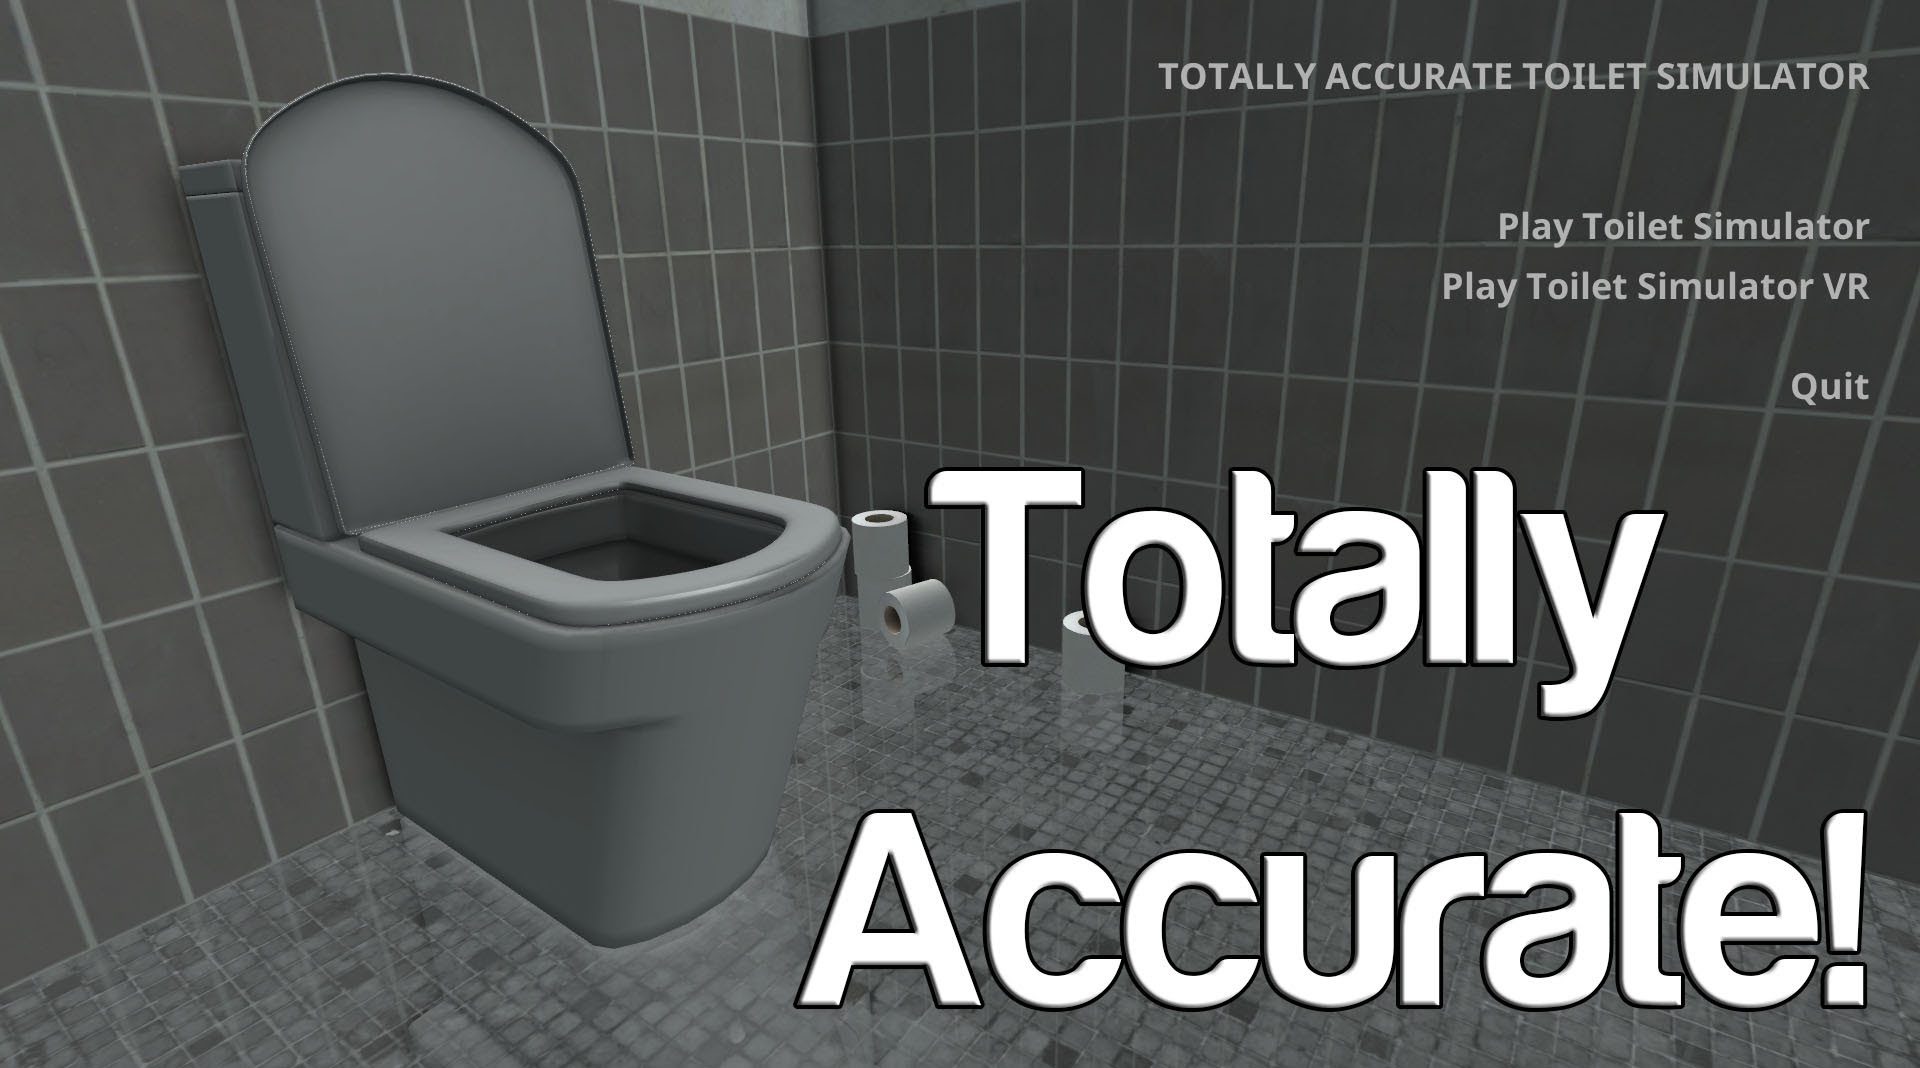 Totally Accurate Toilet Simulator